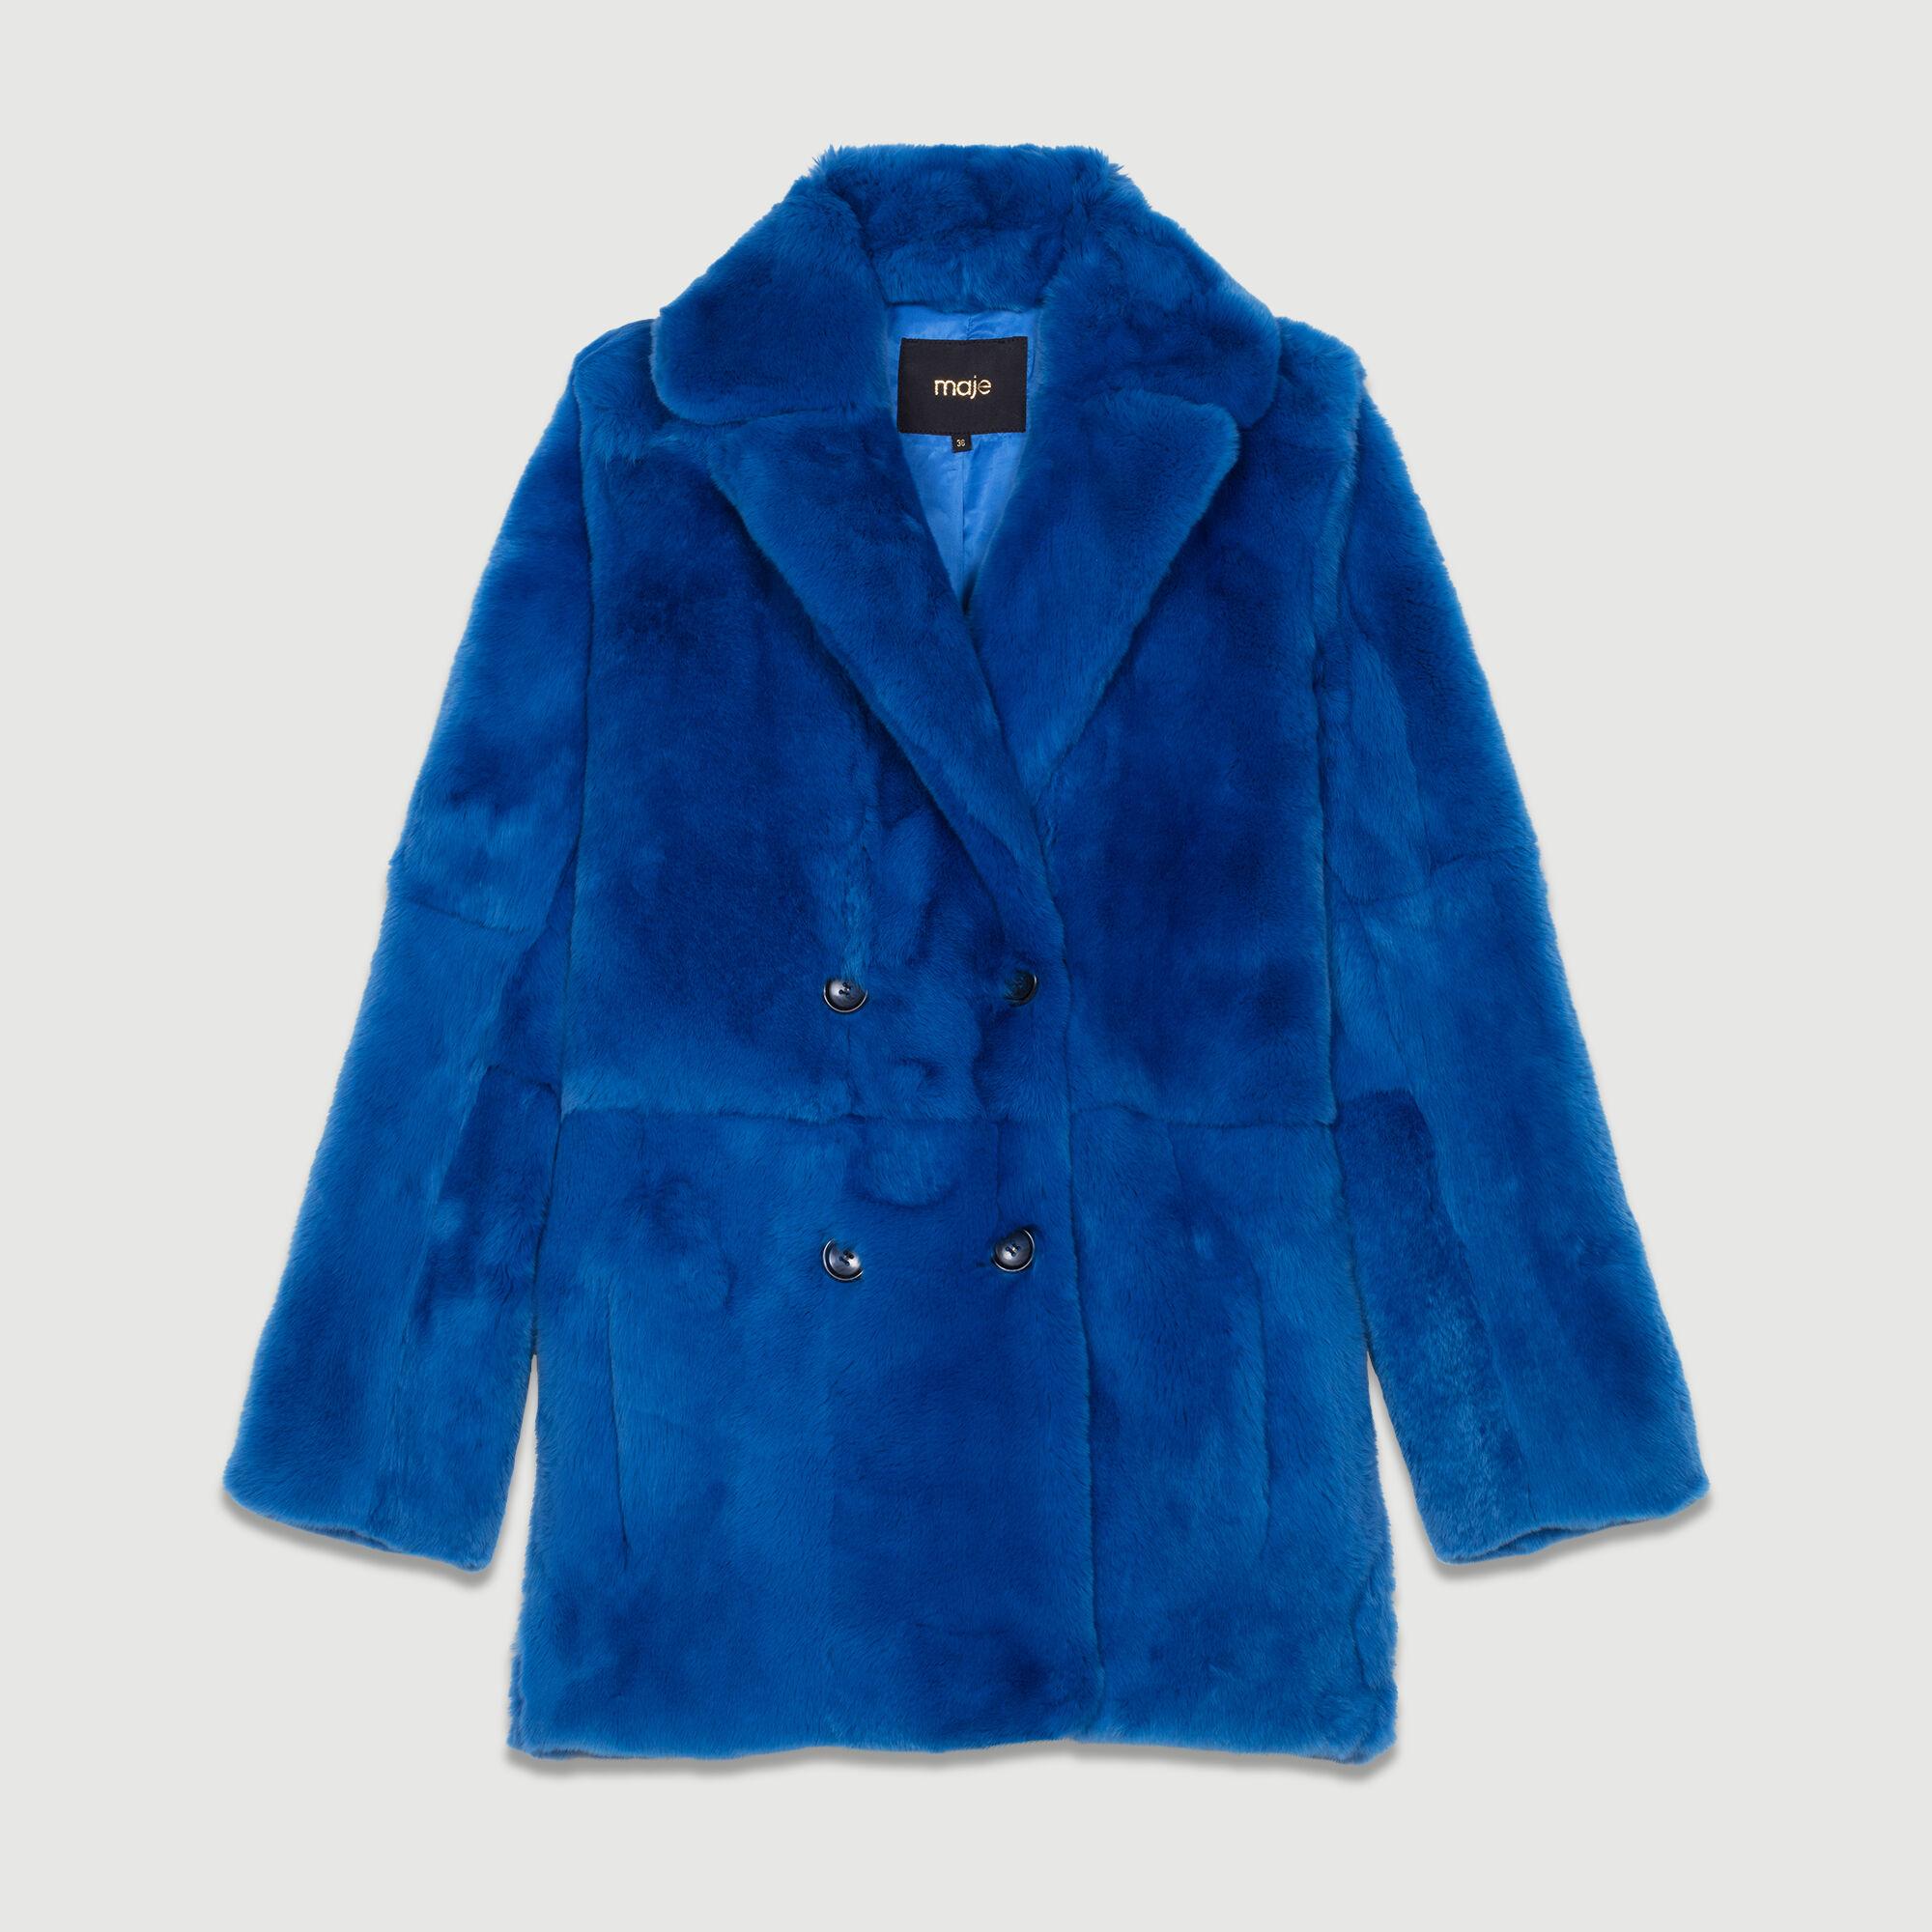 Maje Gati Pz5rz Fur corto Paris en Coat Abrigos Abrigo vmwn0N8